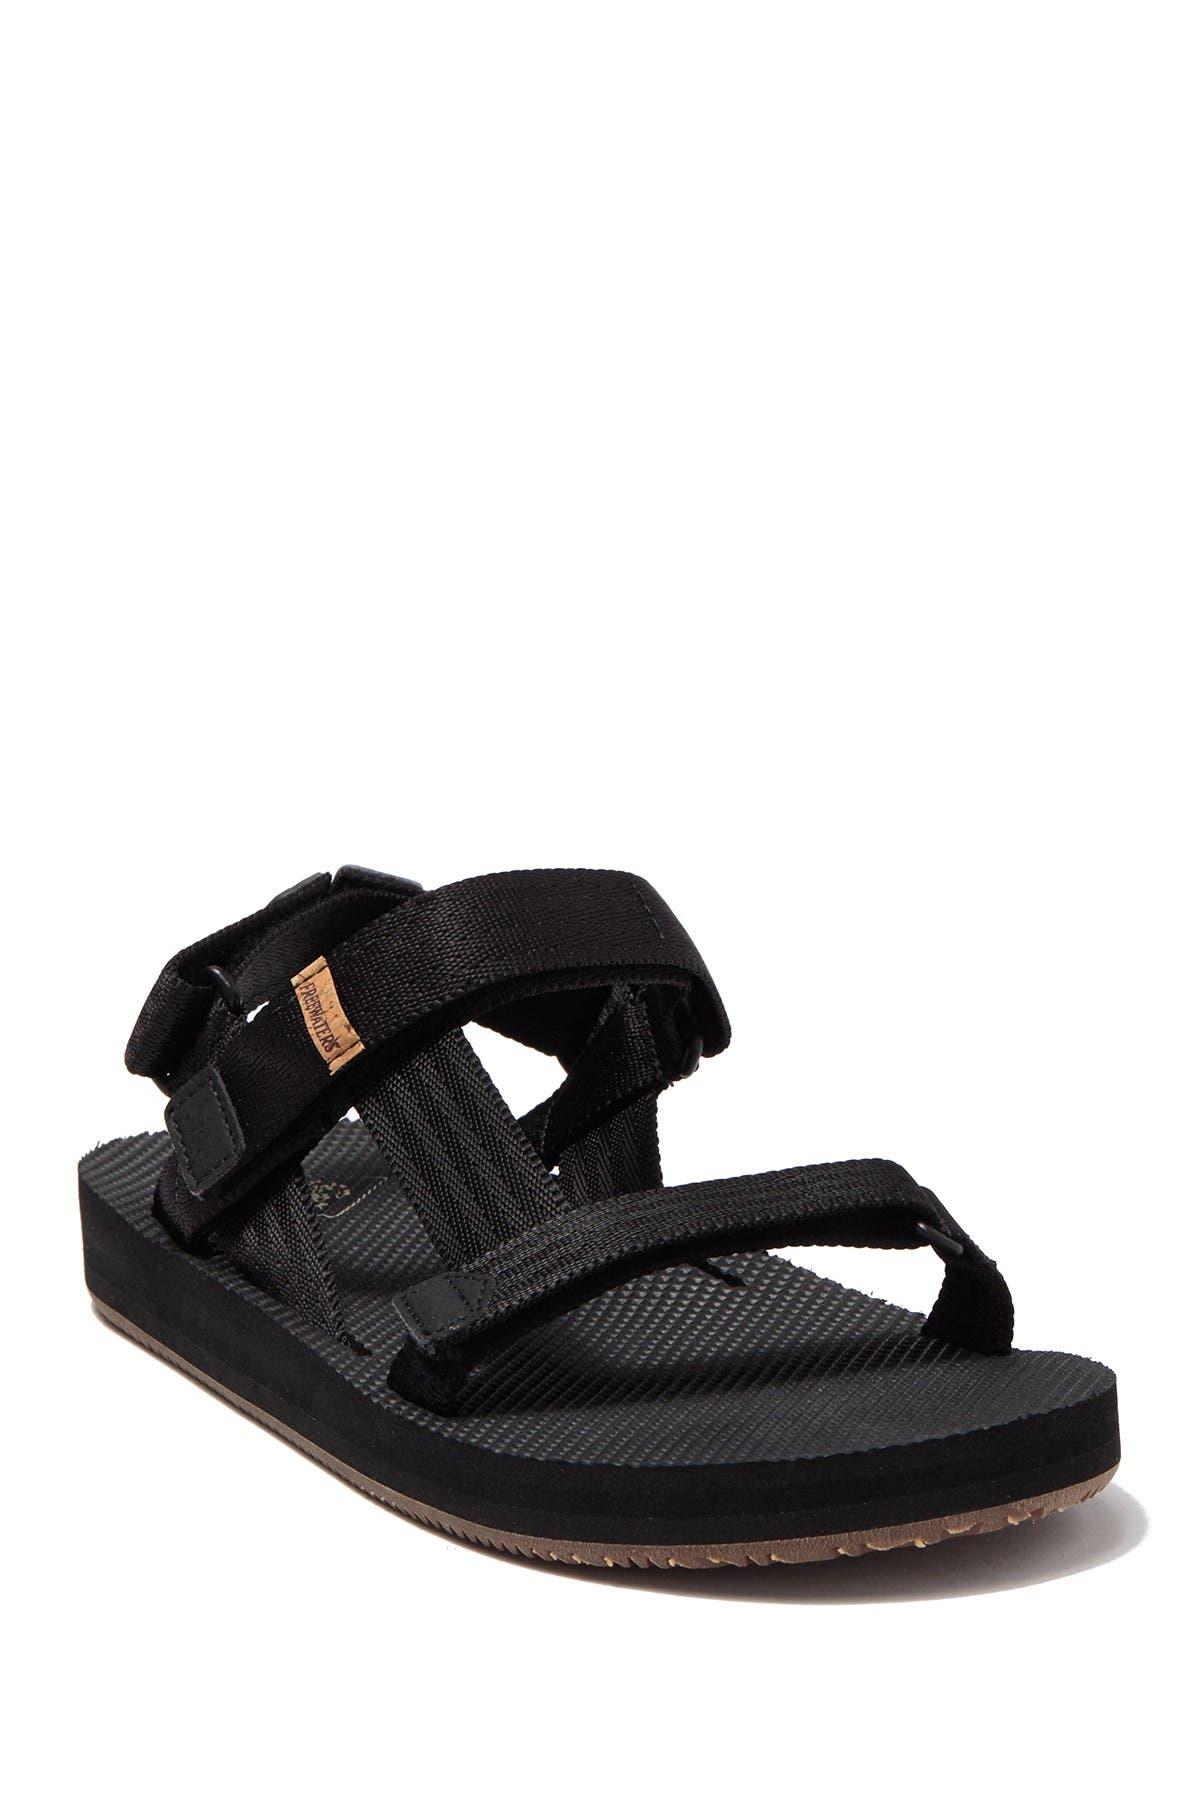 Image of Freewaters Supreem Sport Sandal